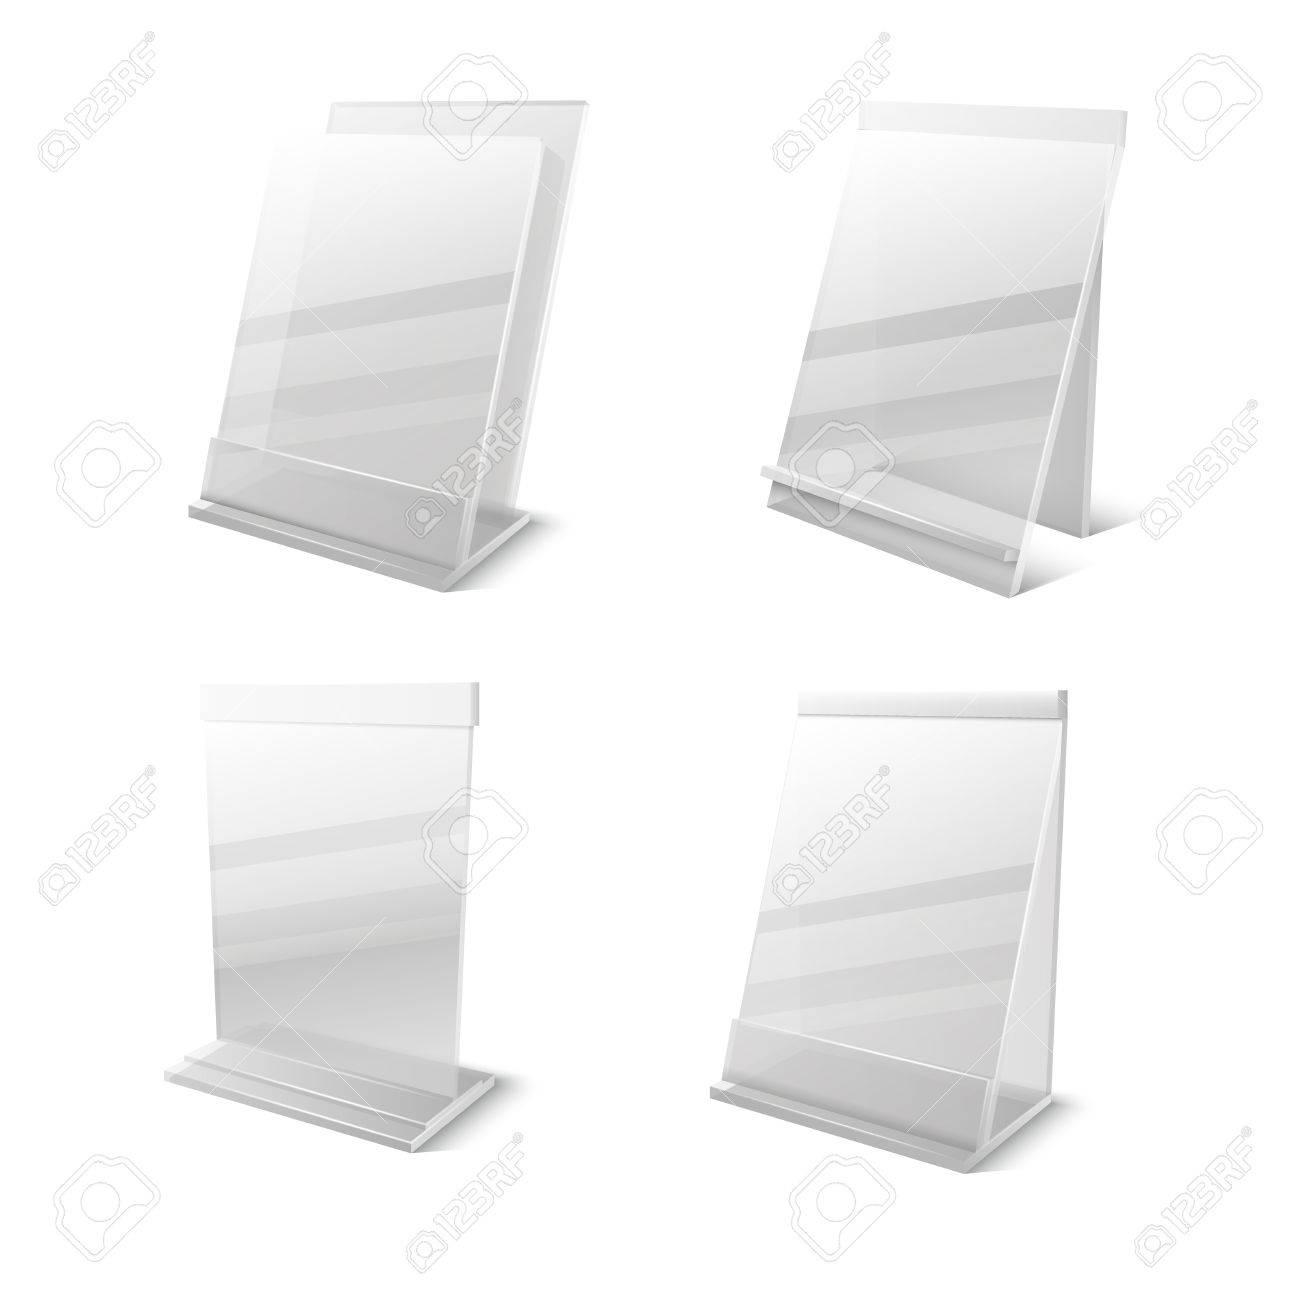 Business-Informationen Transparent Plexiglas Leere Halter Vektor-Set ...